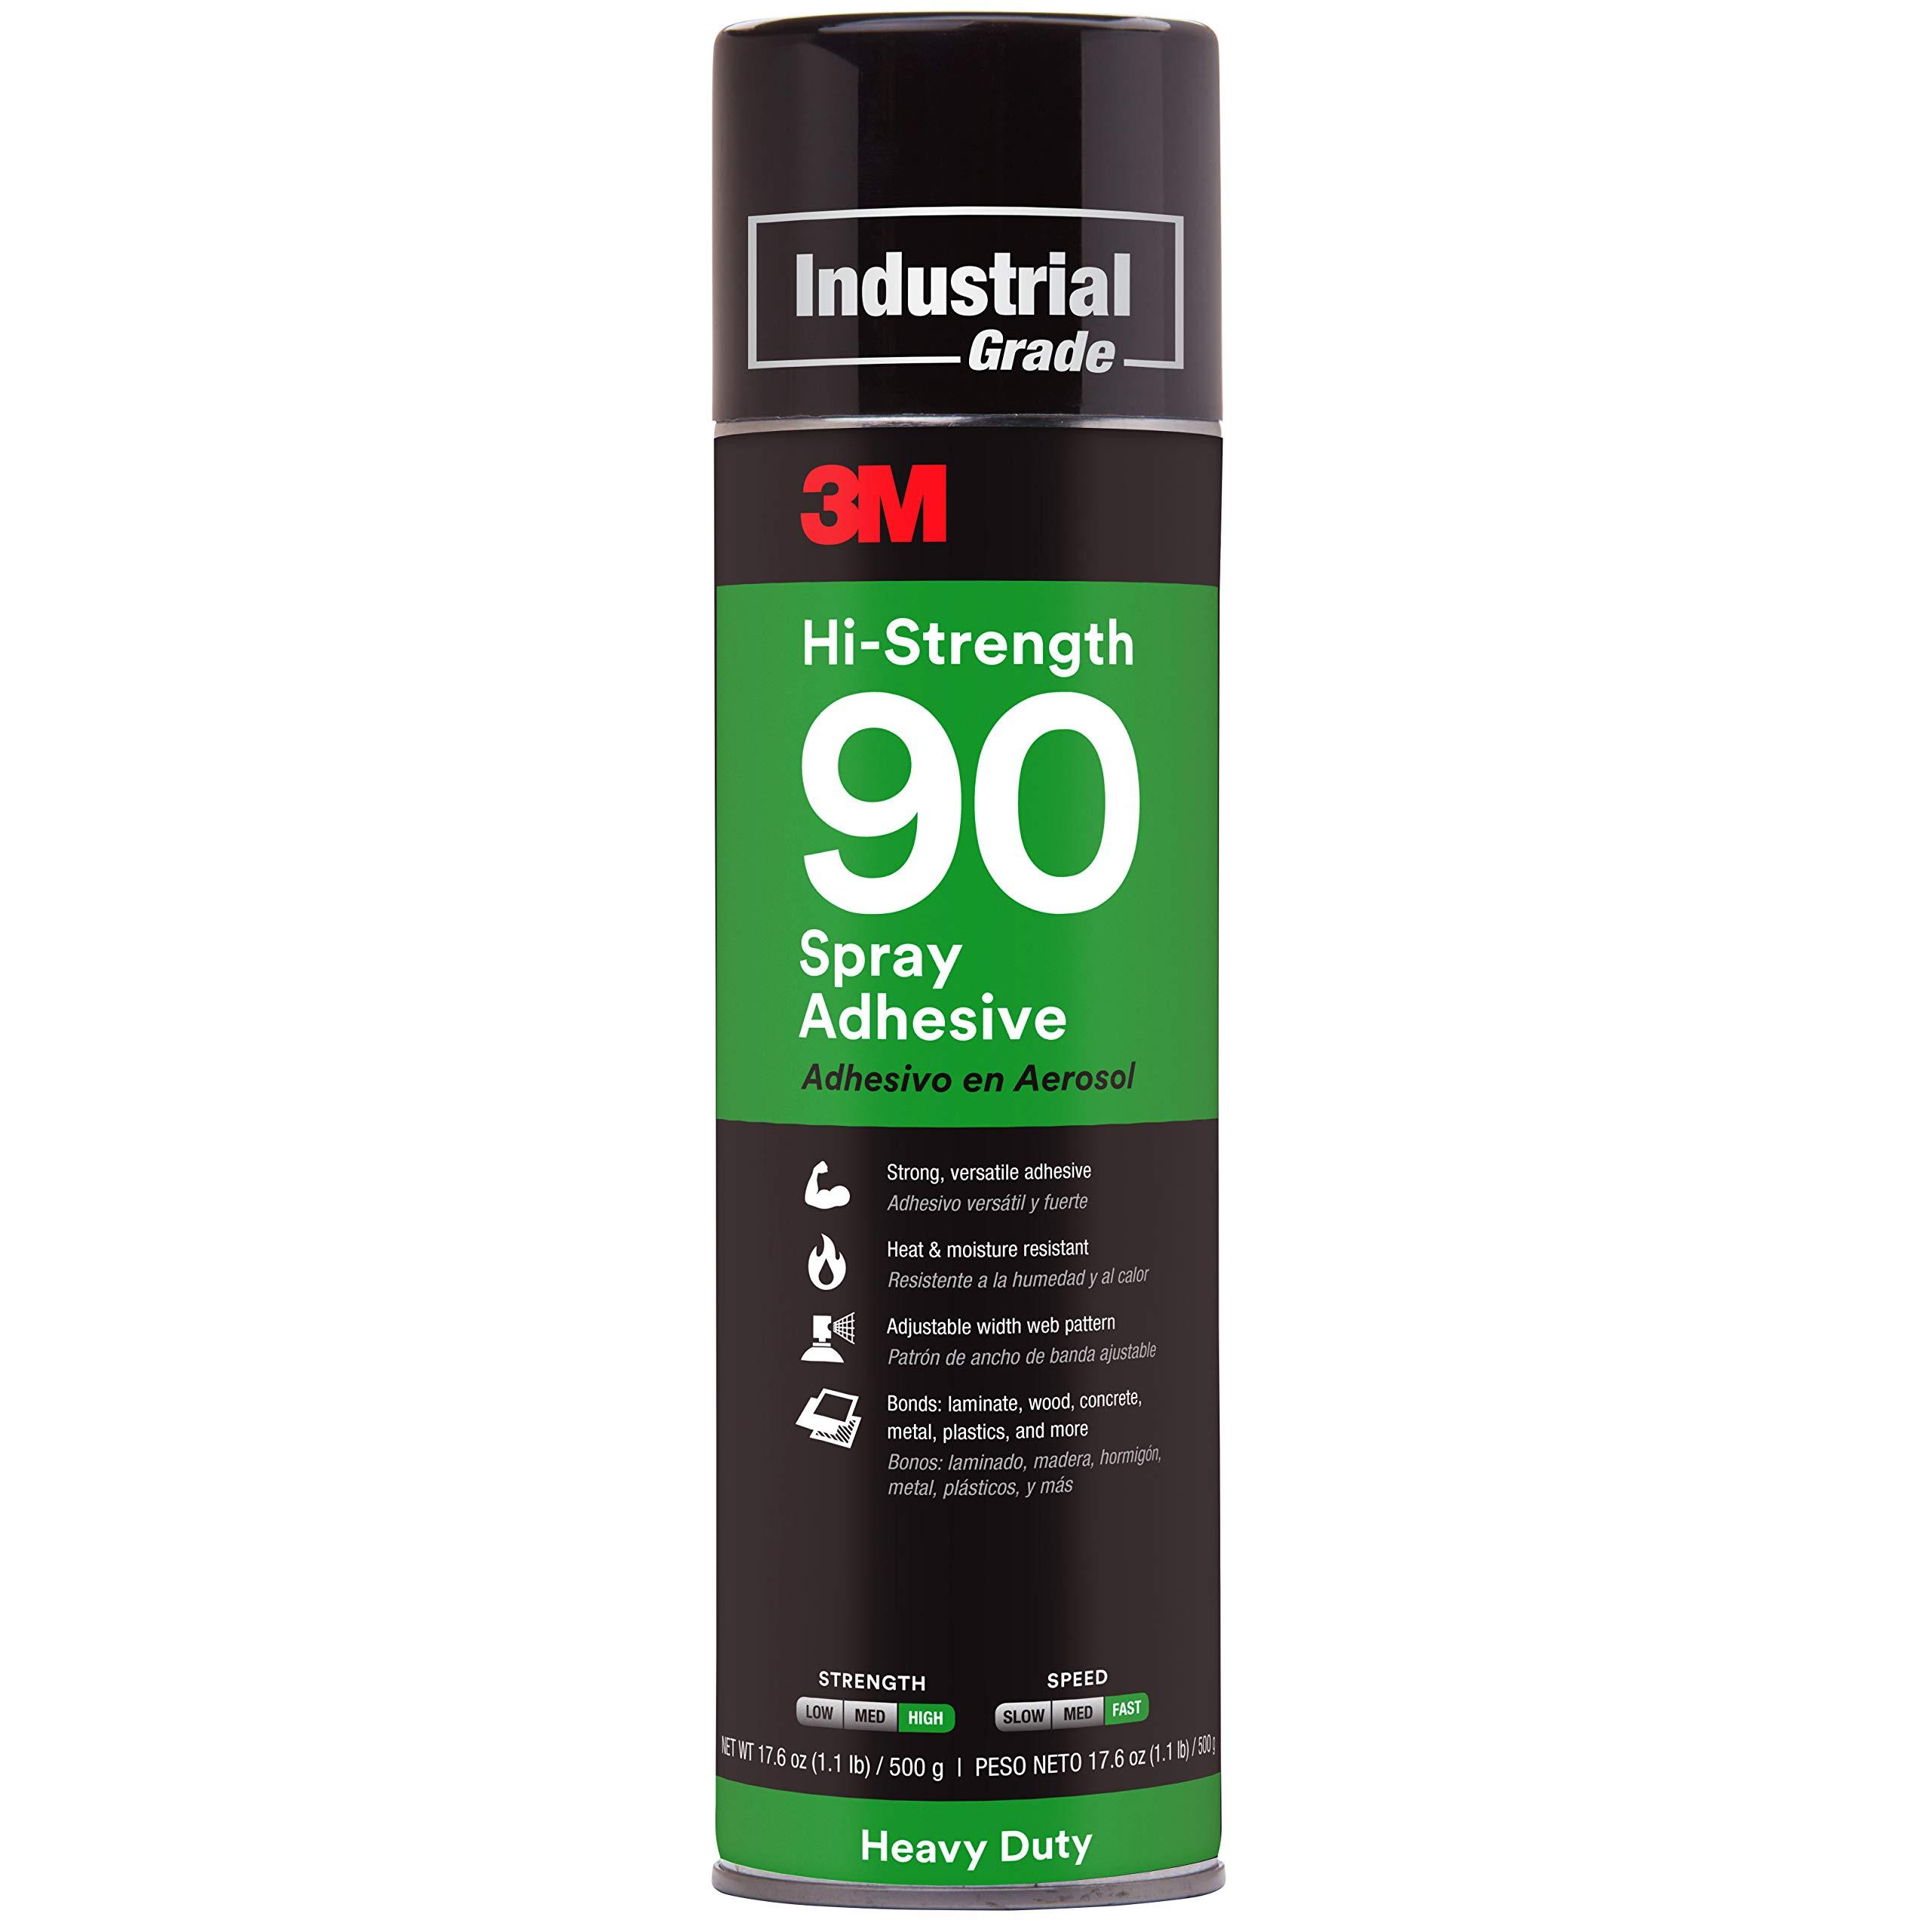 3M Hi-Strength 90 Spray Adhesive, Permanent, Bonds Laminate, Wood, Concrete, Metal, Plastic, Clear Glue, Net Wt 17.6 oz, Will Spray Upside Down